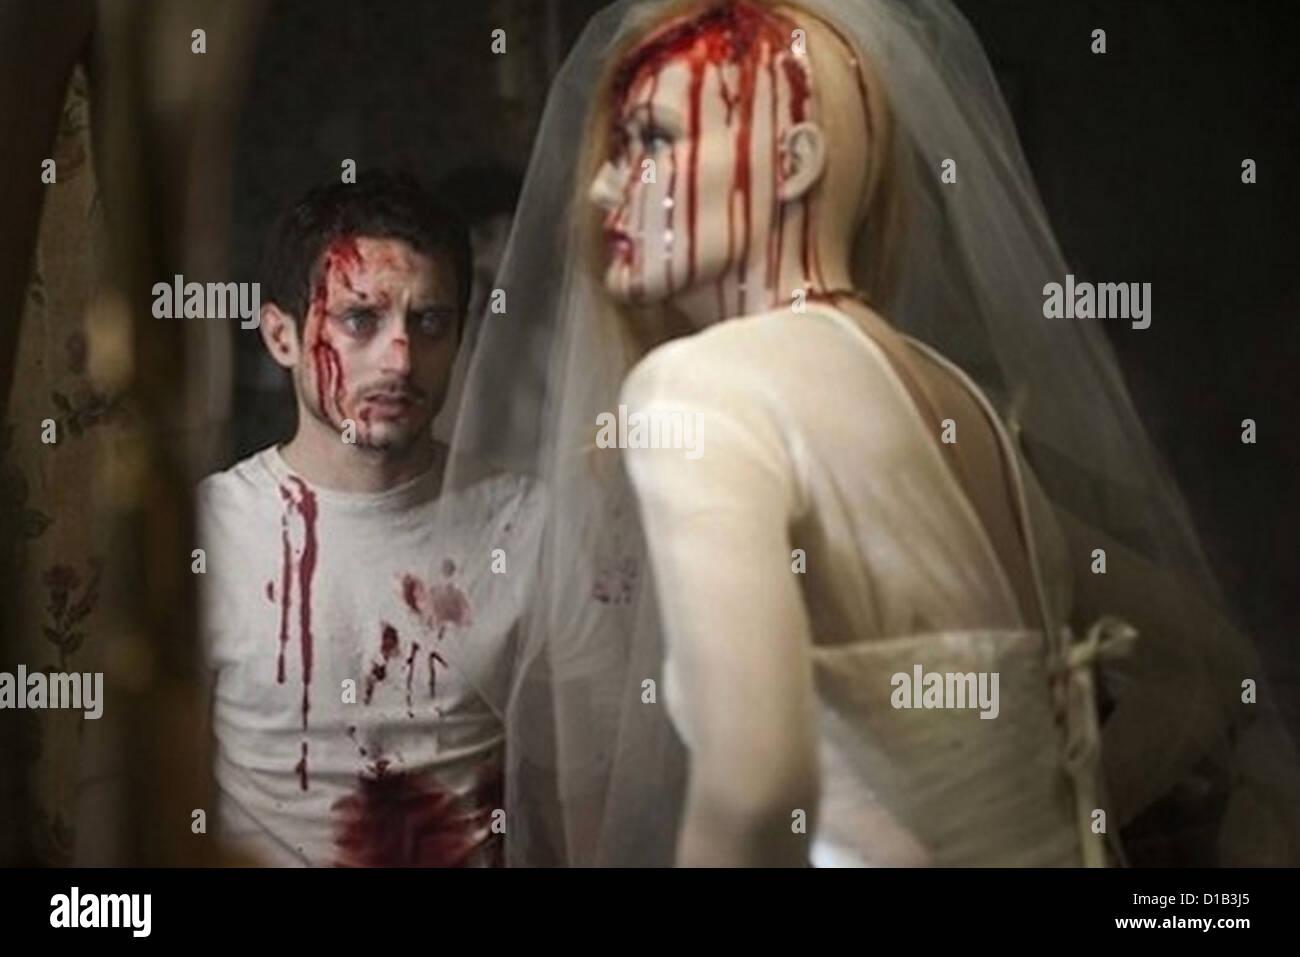 MIDNIGHT'S MANIAC 2013 IFC film with Elijah Wood as Frank - Stock Image